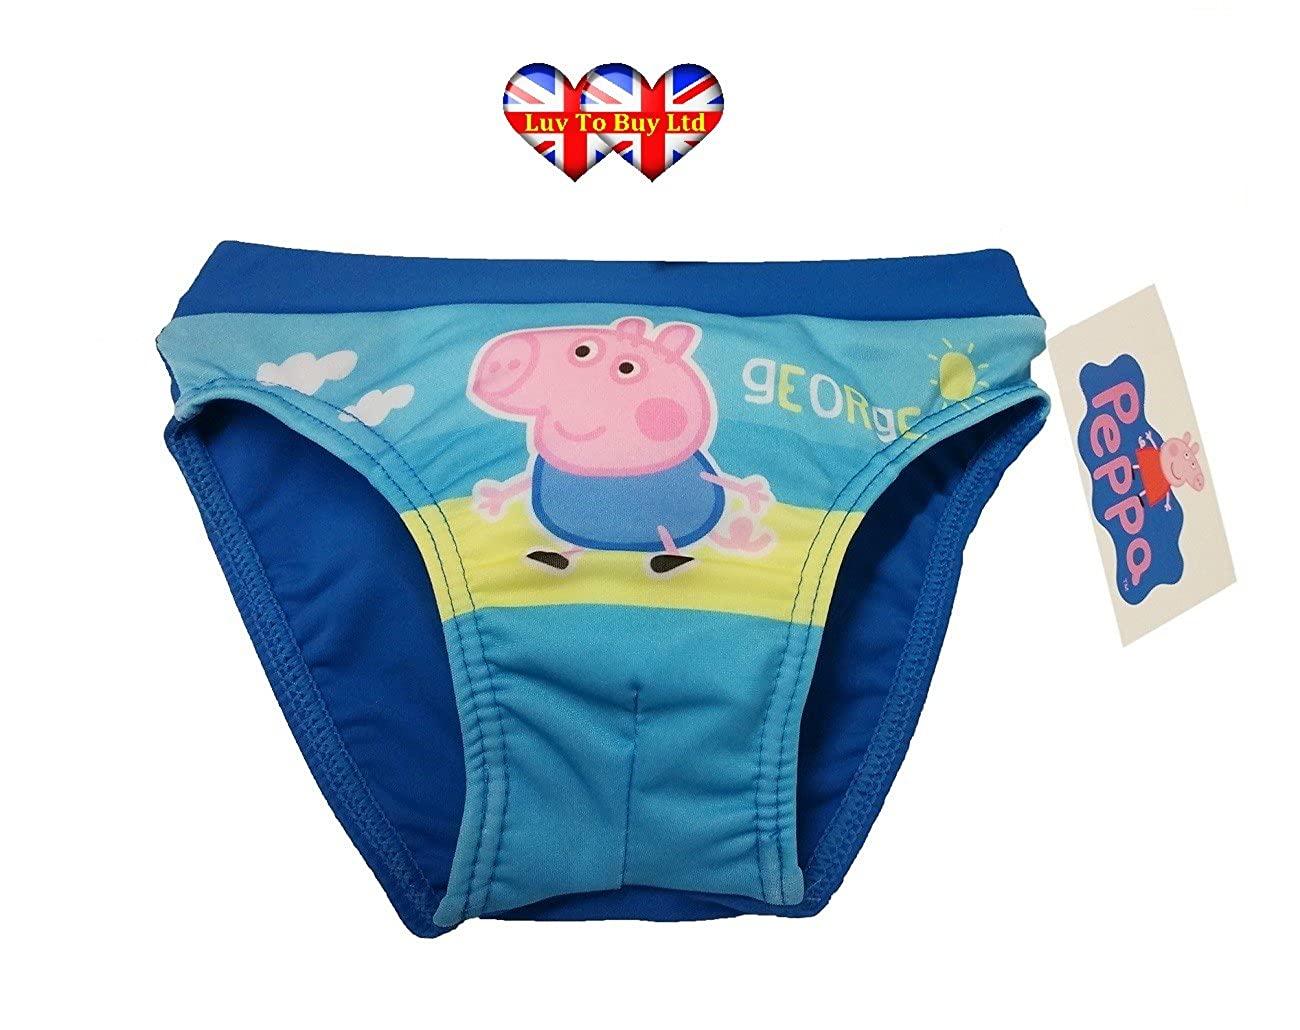 4775d8d2f75f1 Amazon.com: Peppa Pig Boys Swimming Shorts, George Pig Trunks, Boys Swimwear  (2, 3, 4, 5, 6 Years): Clothing